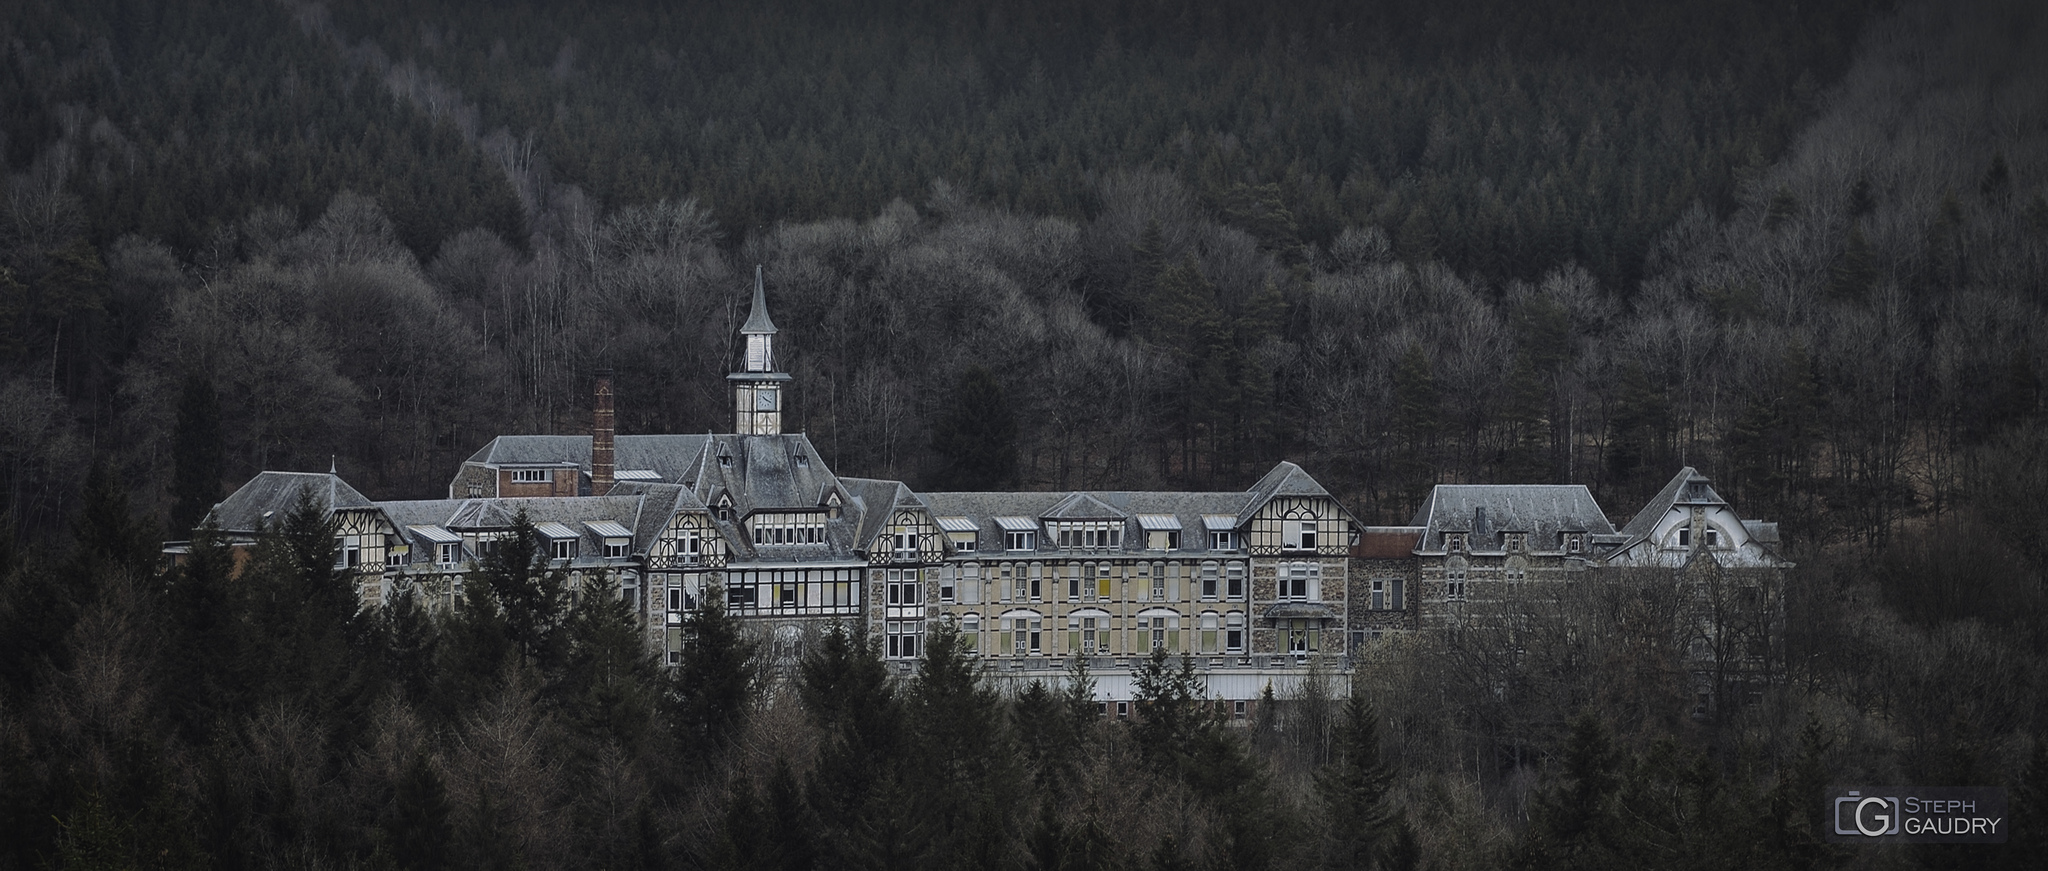 Ancien sanatorium de Borgoumont (sanatorium du Basil) [Click to start slideshow]